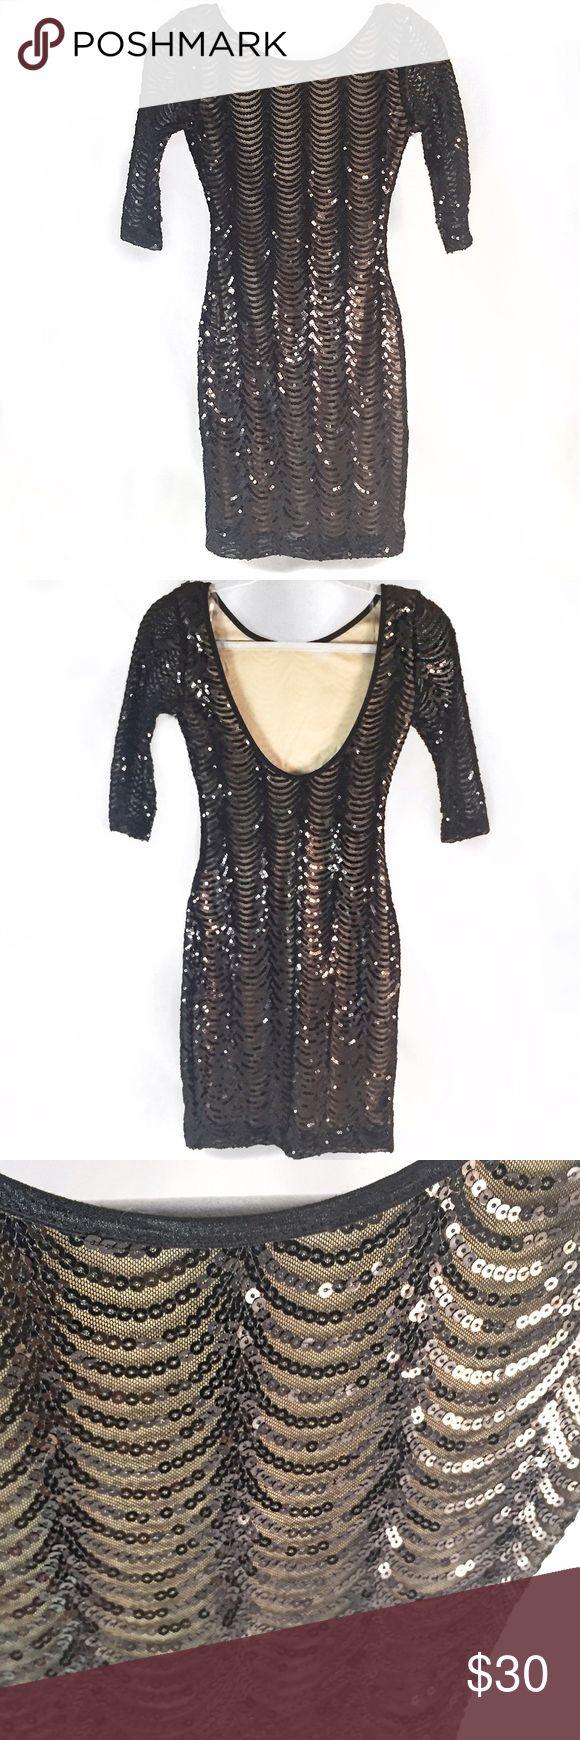 🎈SUPER SALE🎈Sequin black on nude Cocktail Dress Mini dress. Elegant and chic. Black sequin on nude background. Open back Vintage Dresses Mini